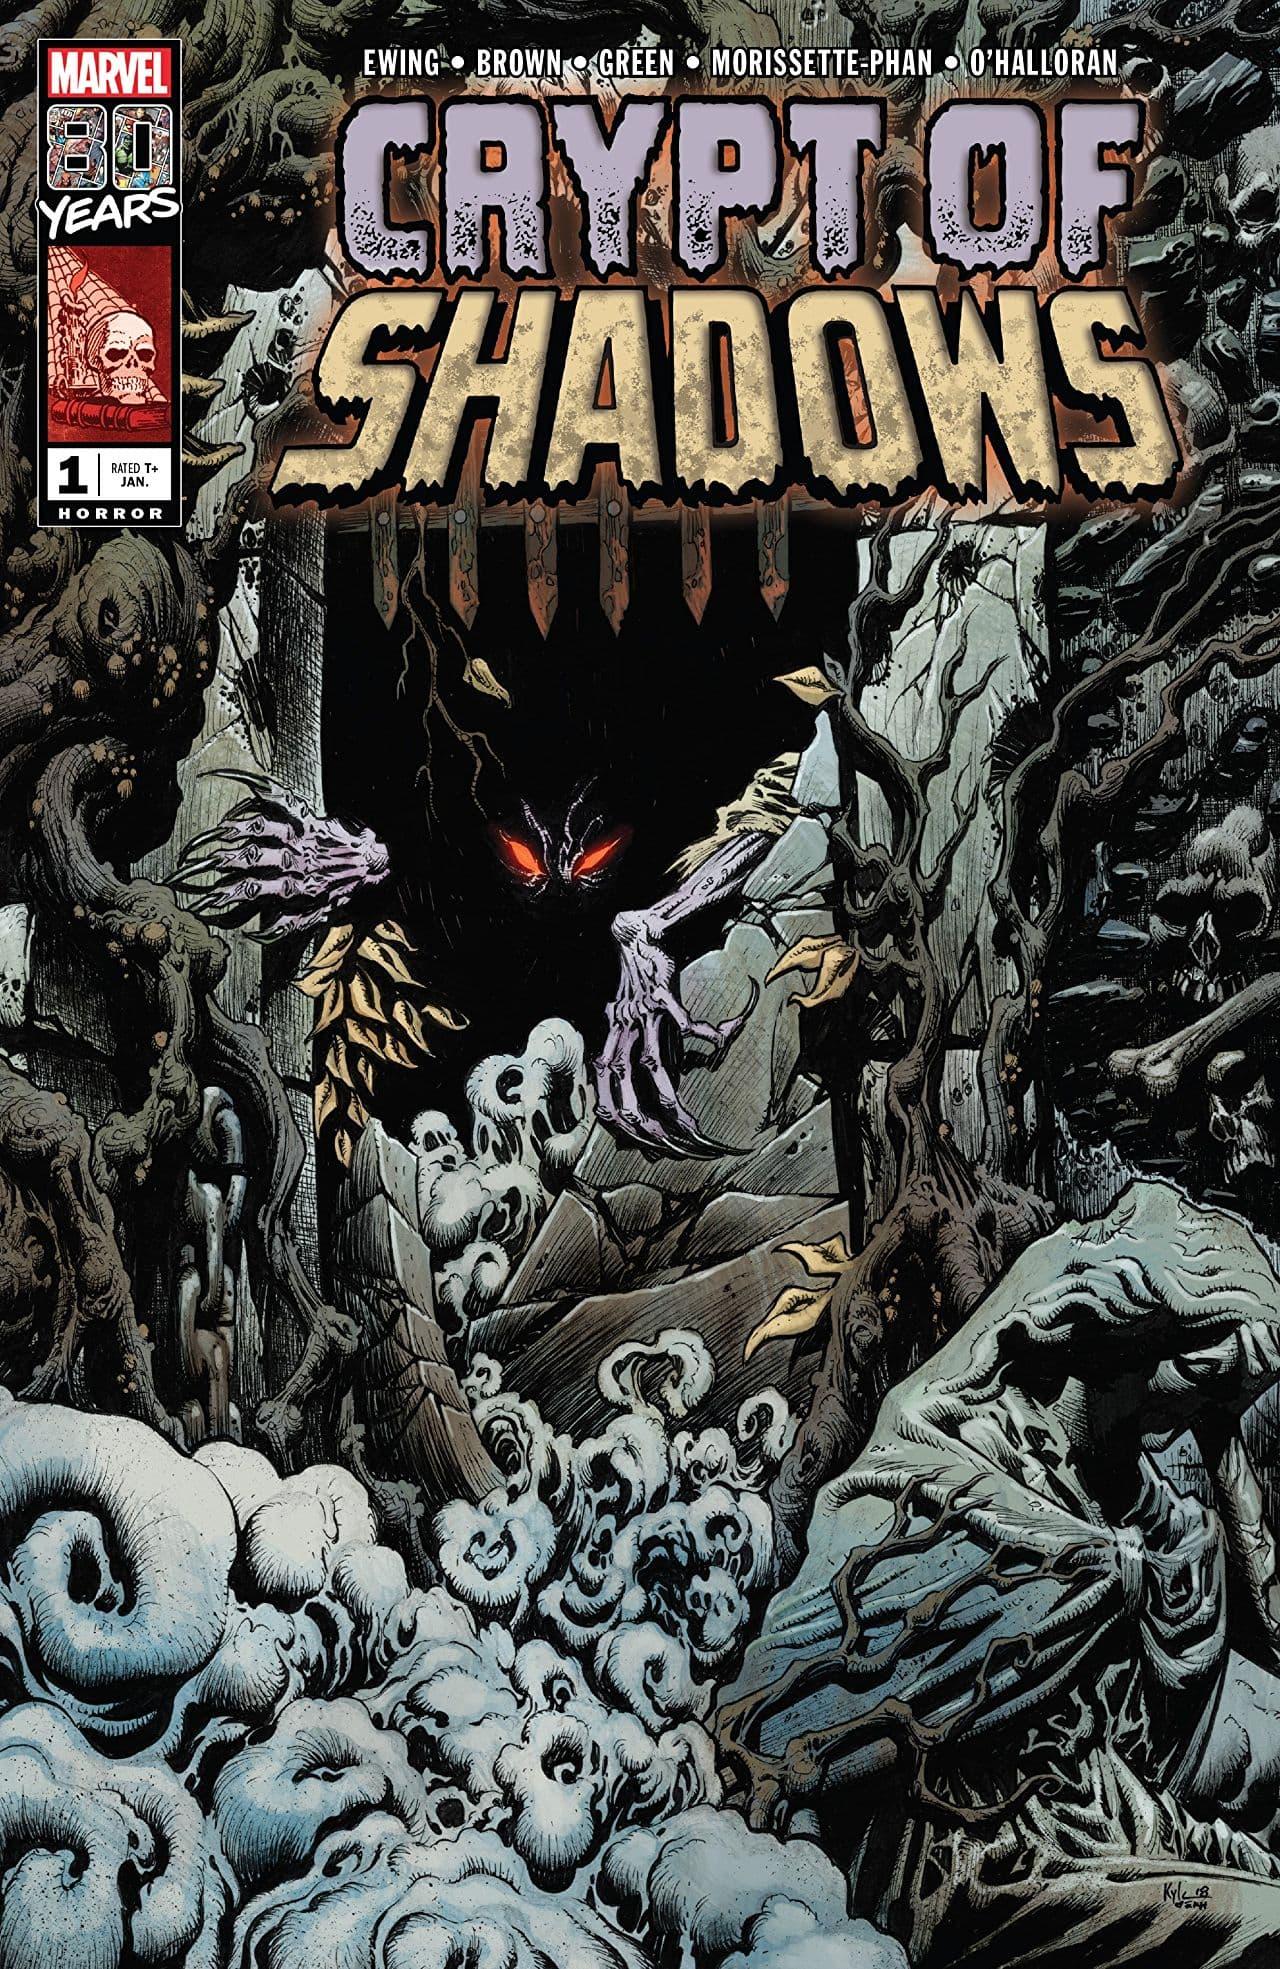 CRYPT OF SHADOWS #1